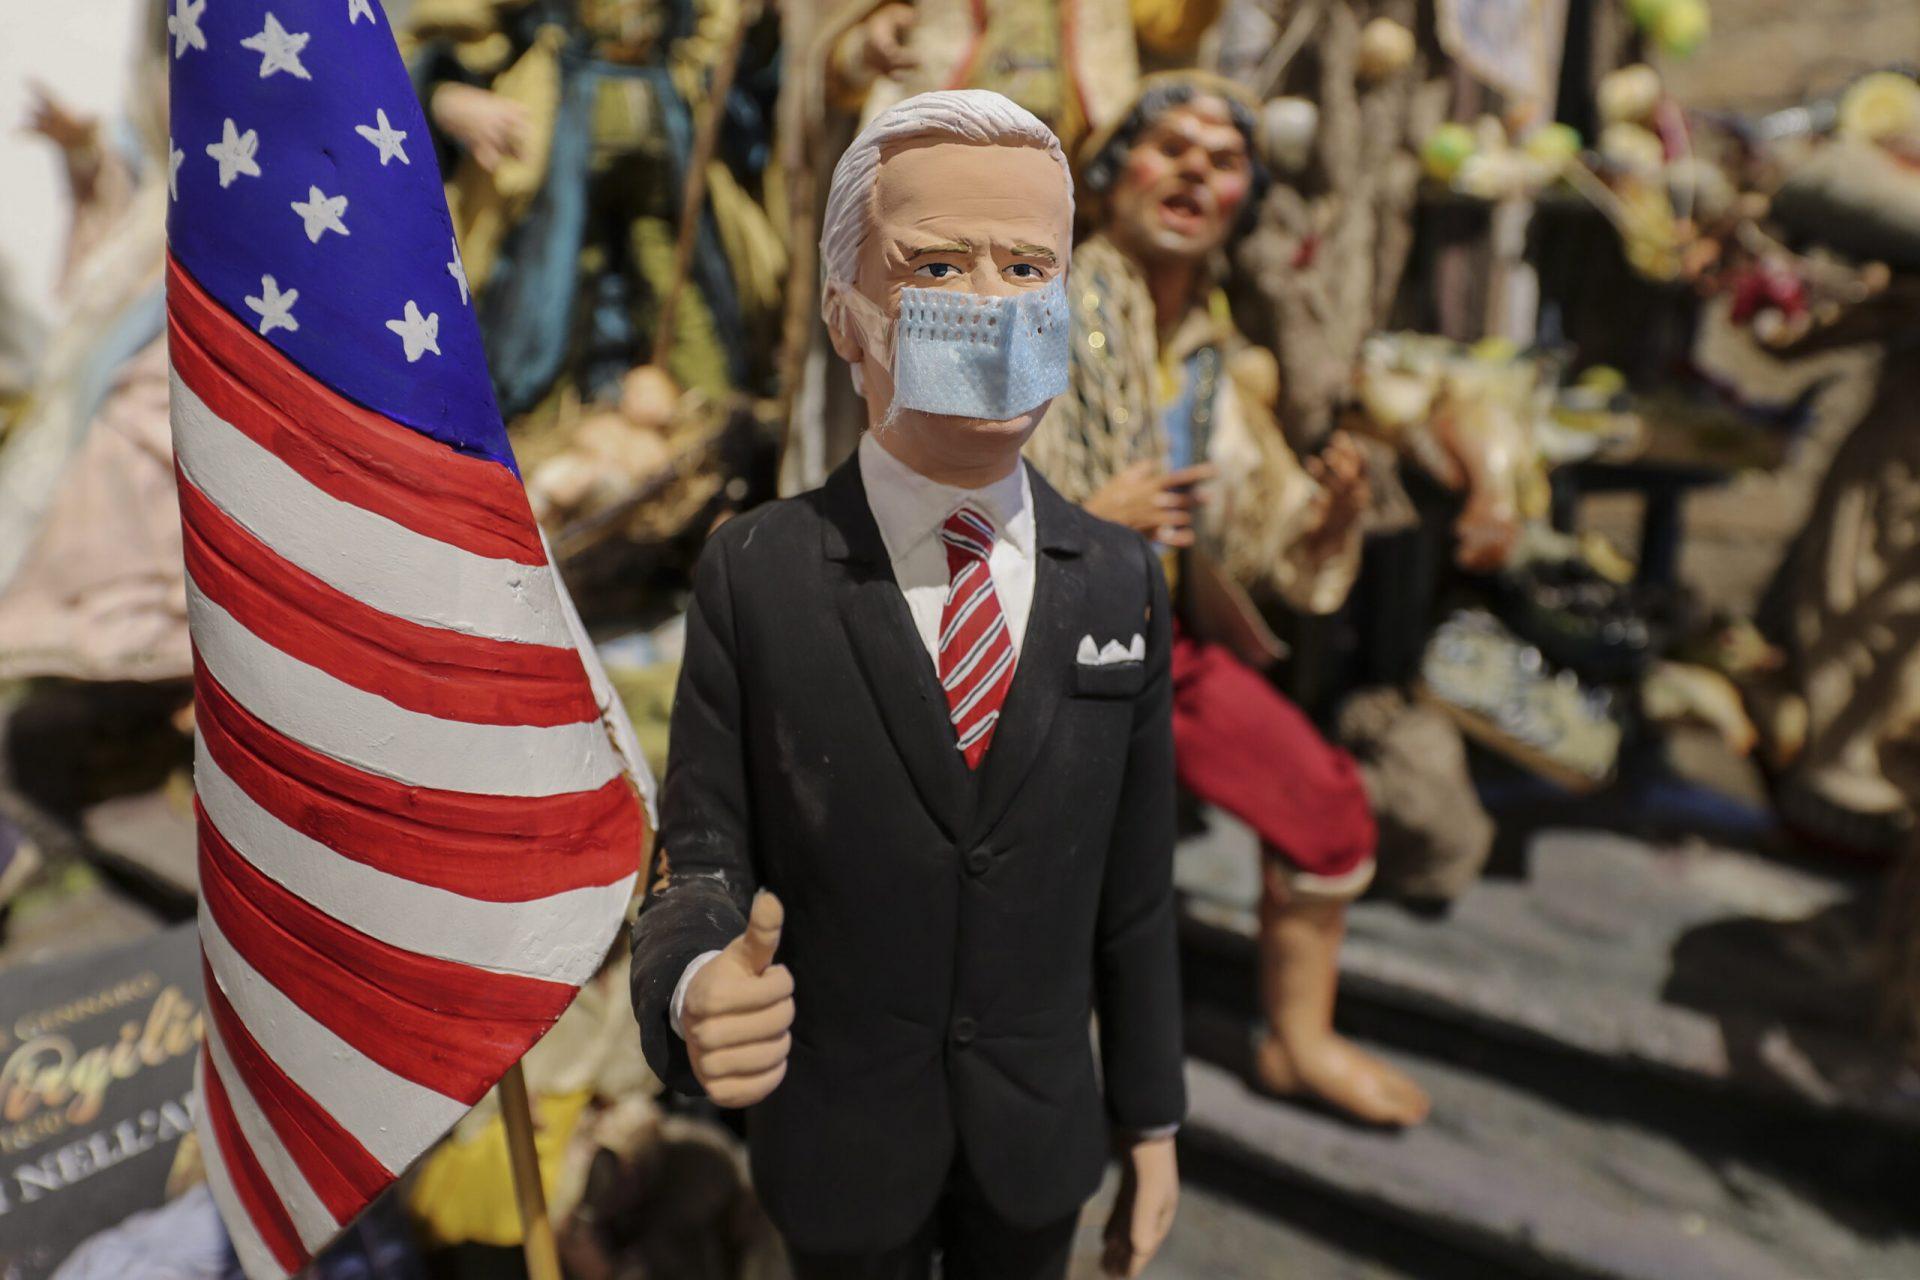 Presepio President Biden